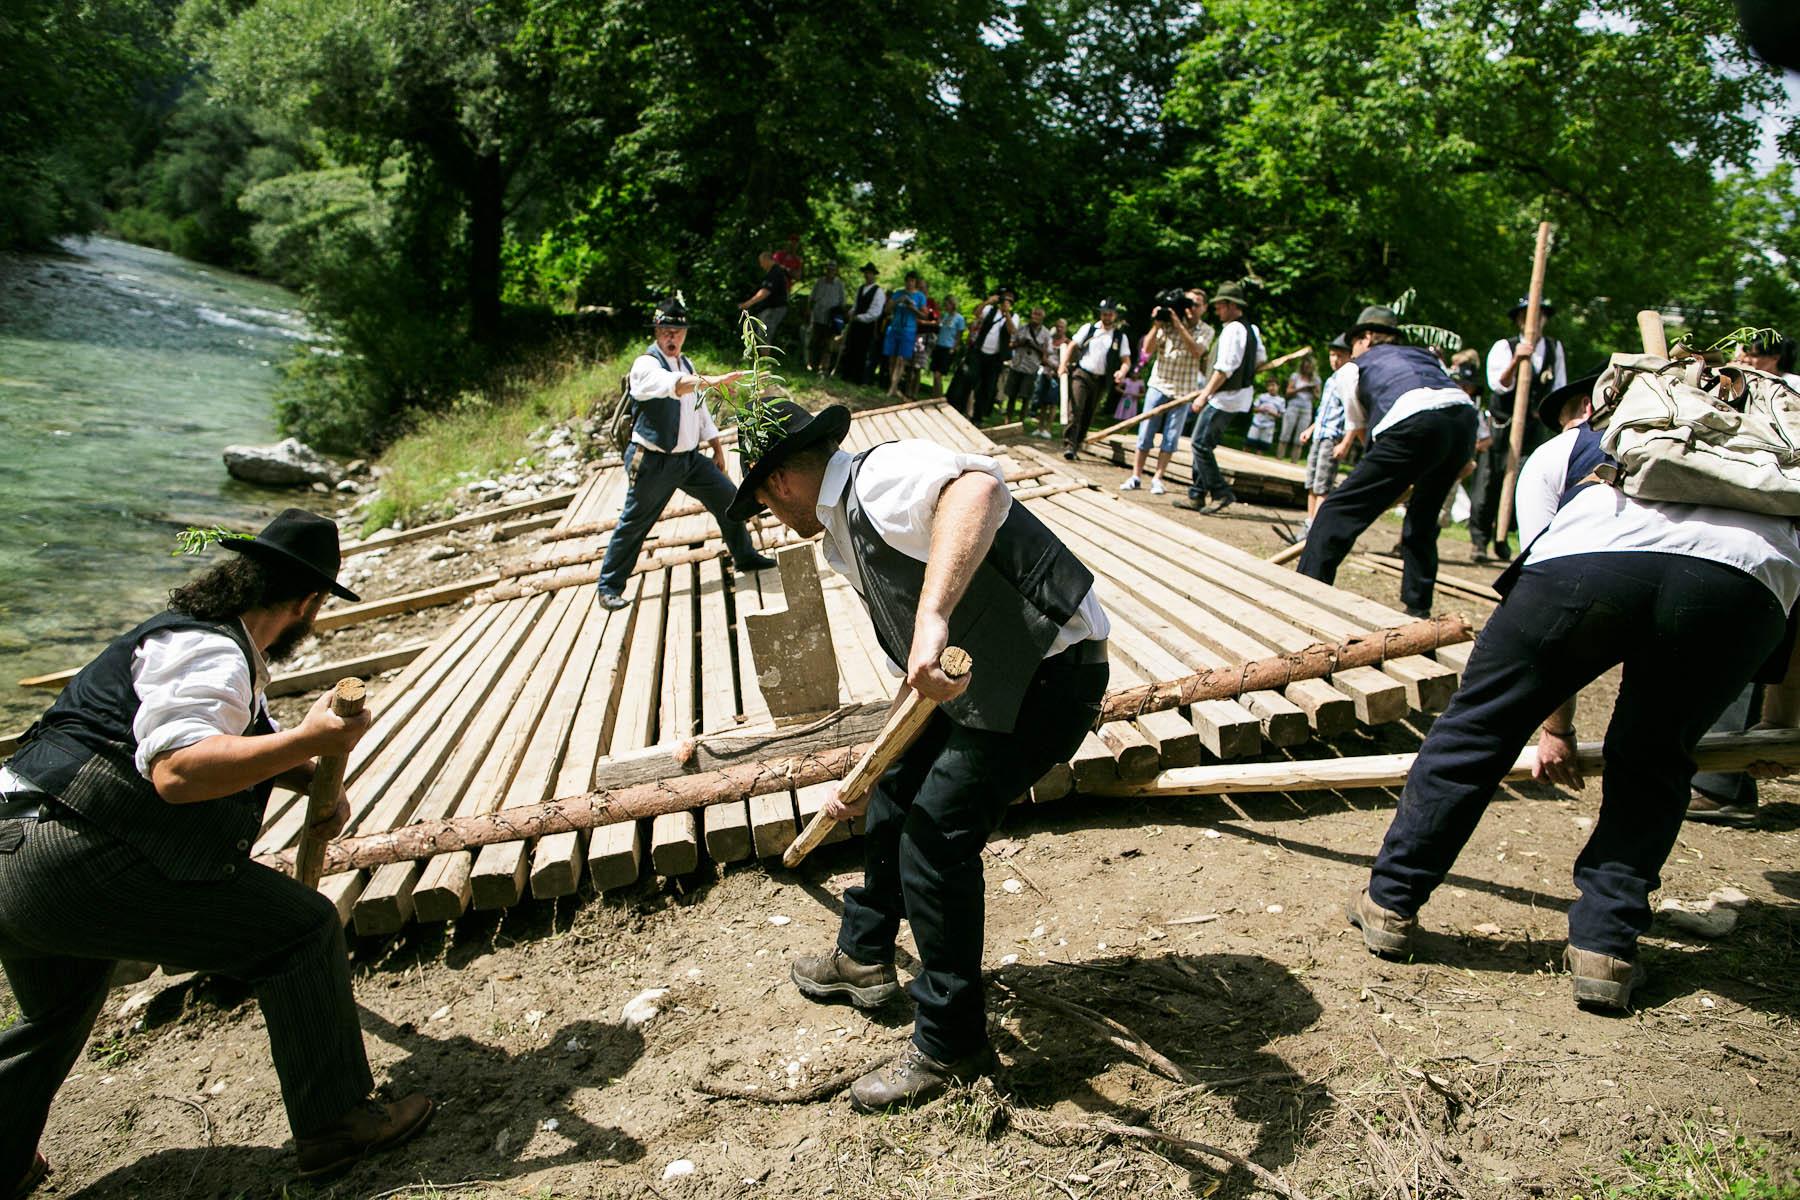 Raftsmen launch a raft into Savinja river during the 55th Raftsmen Ball in Ljubno ob Savinji, Slovenia.